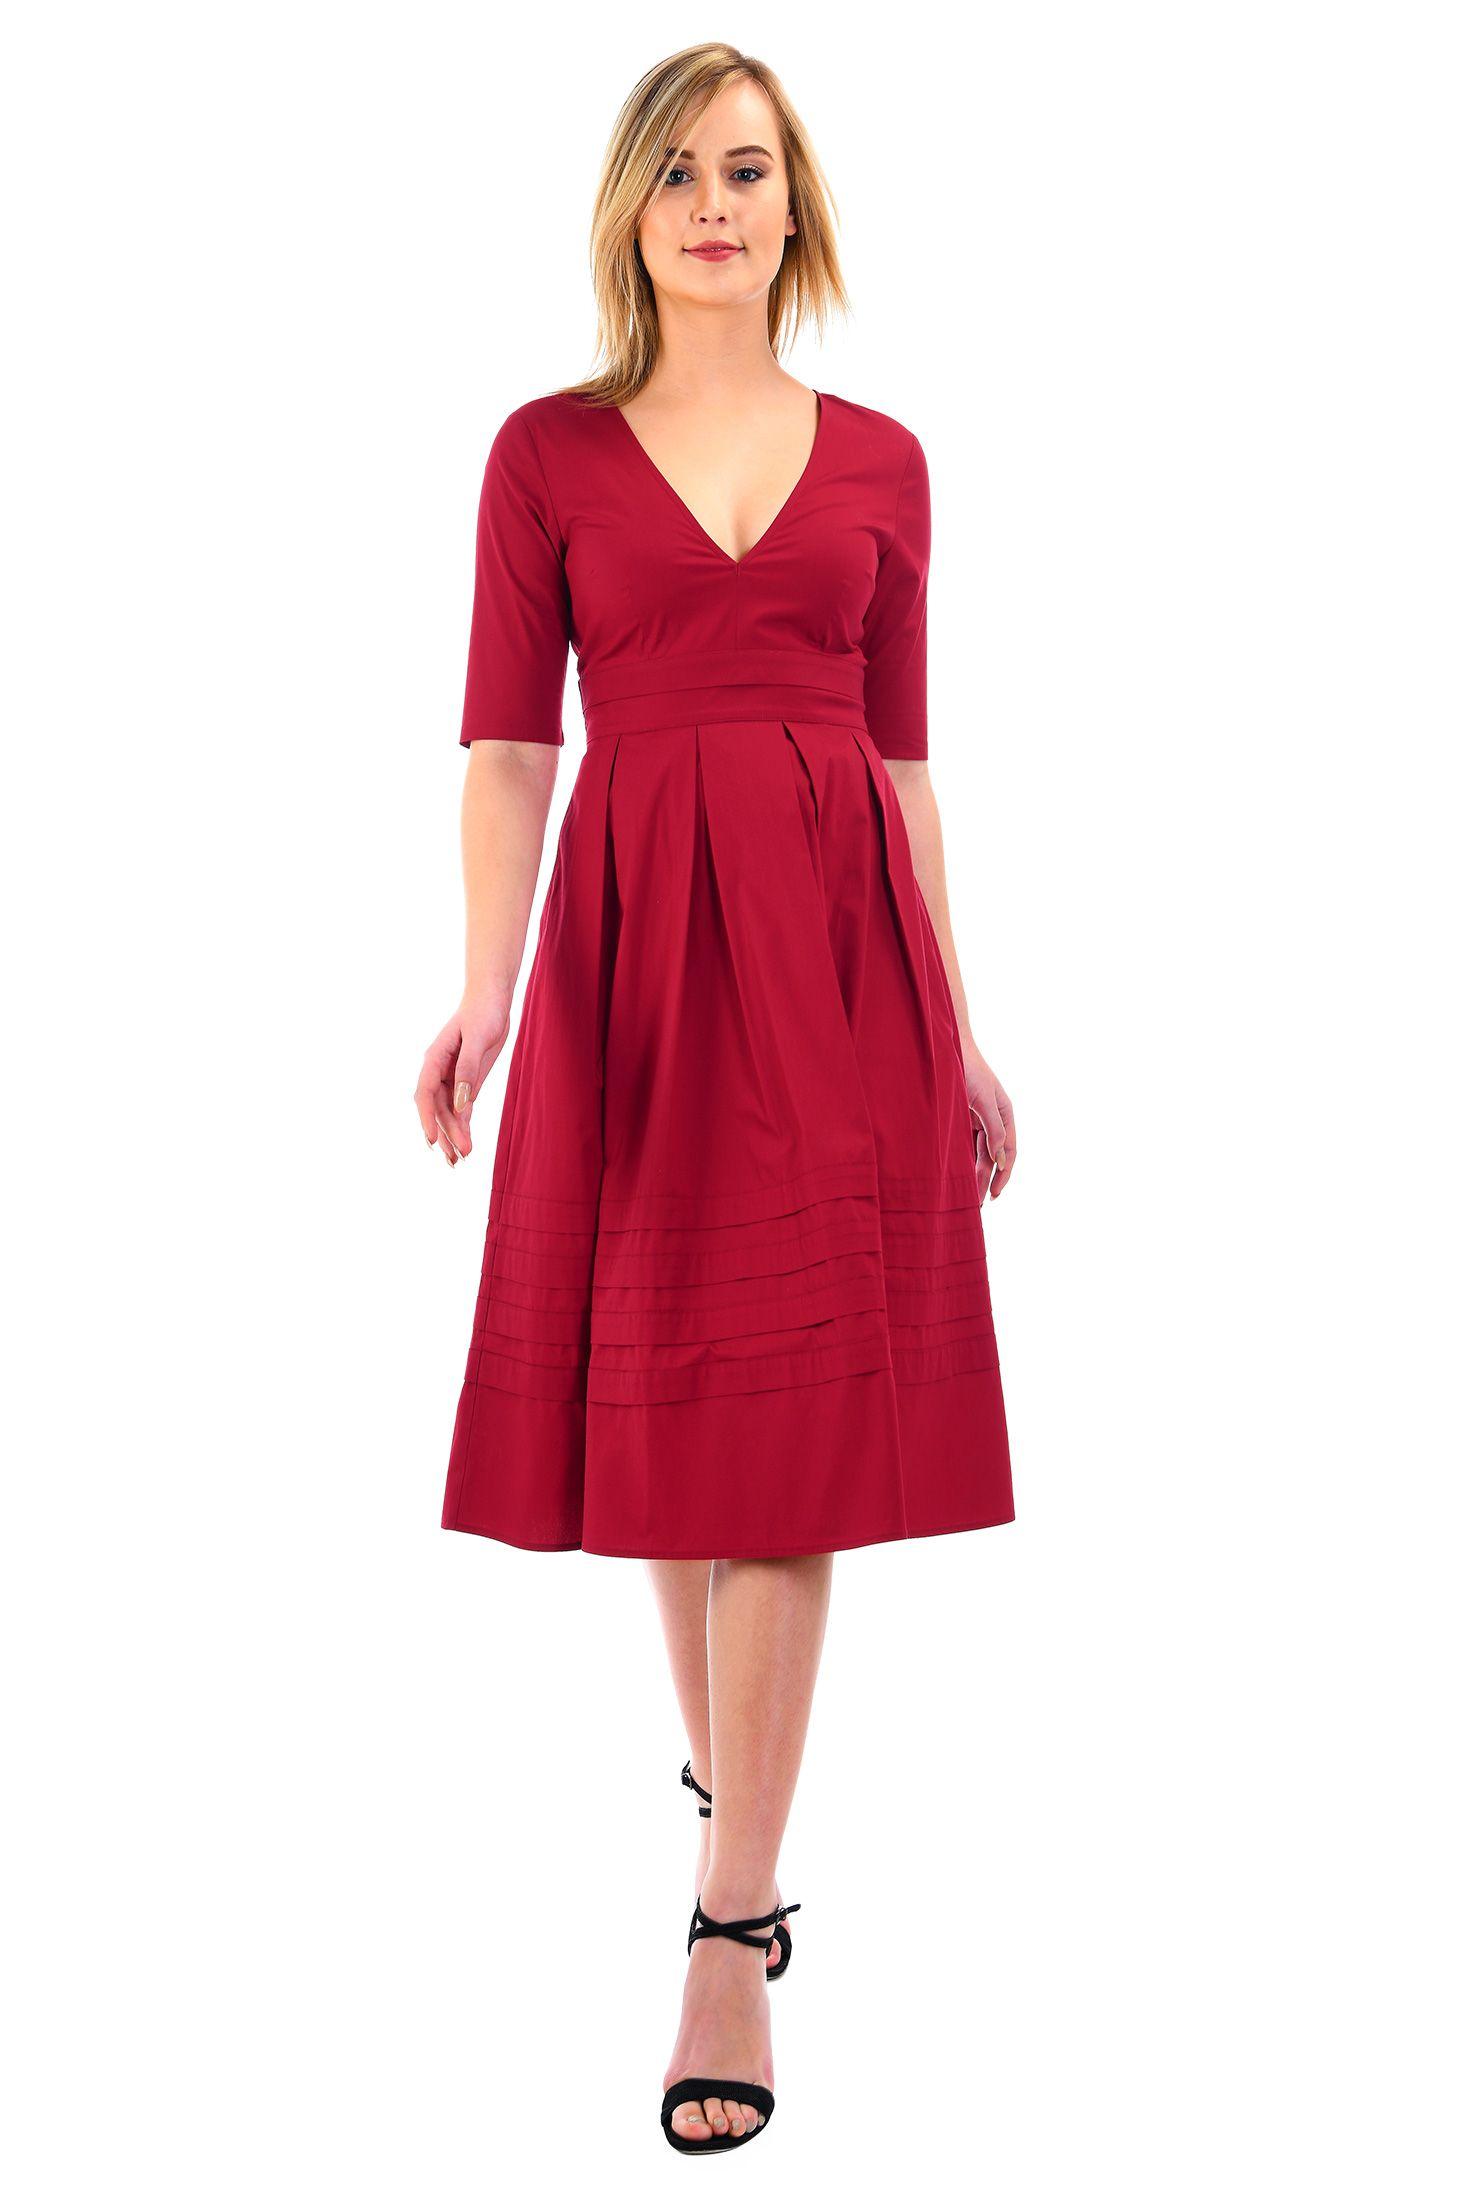 below knee length dresses cottonspandex Dresses daytoevening